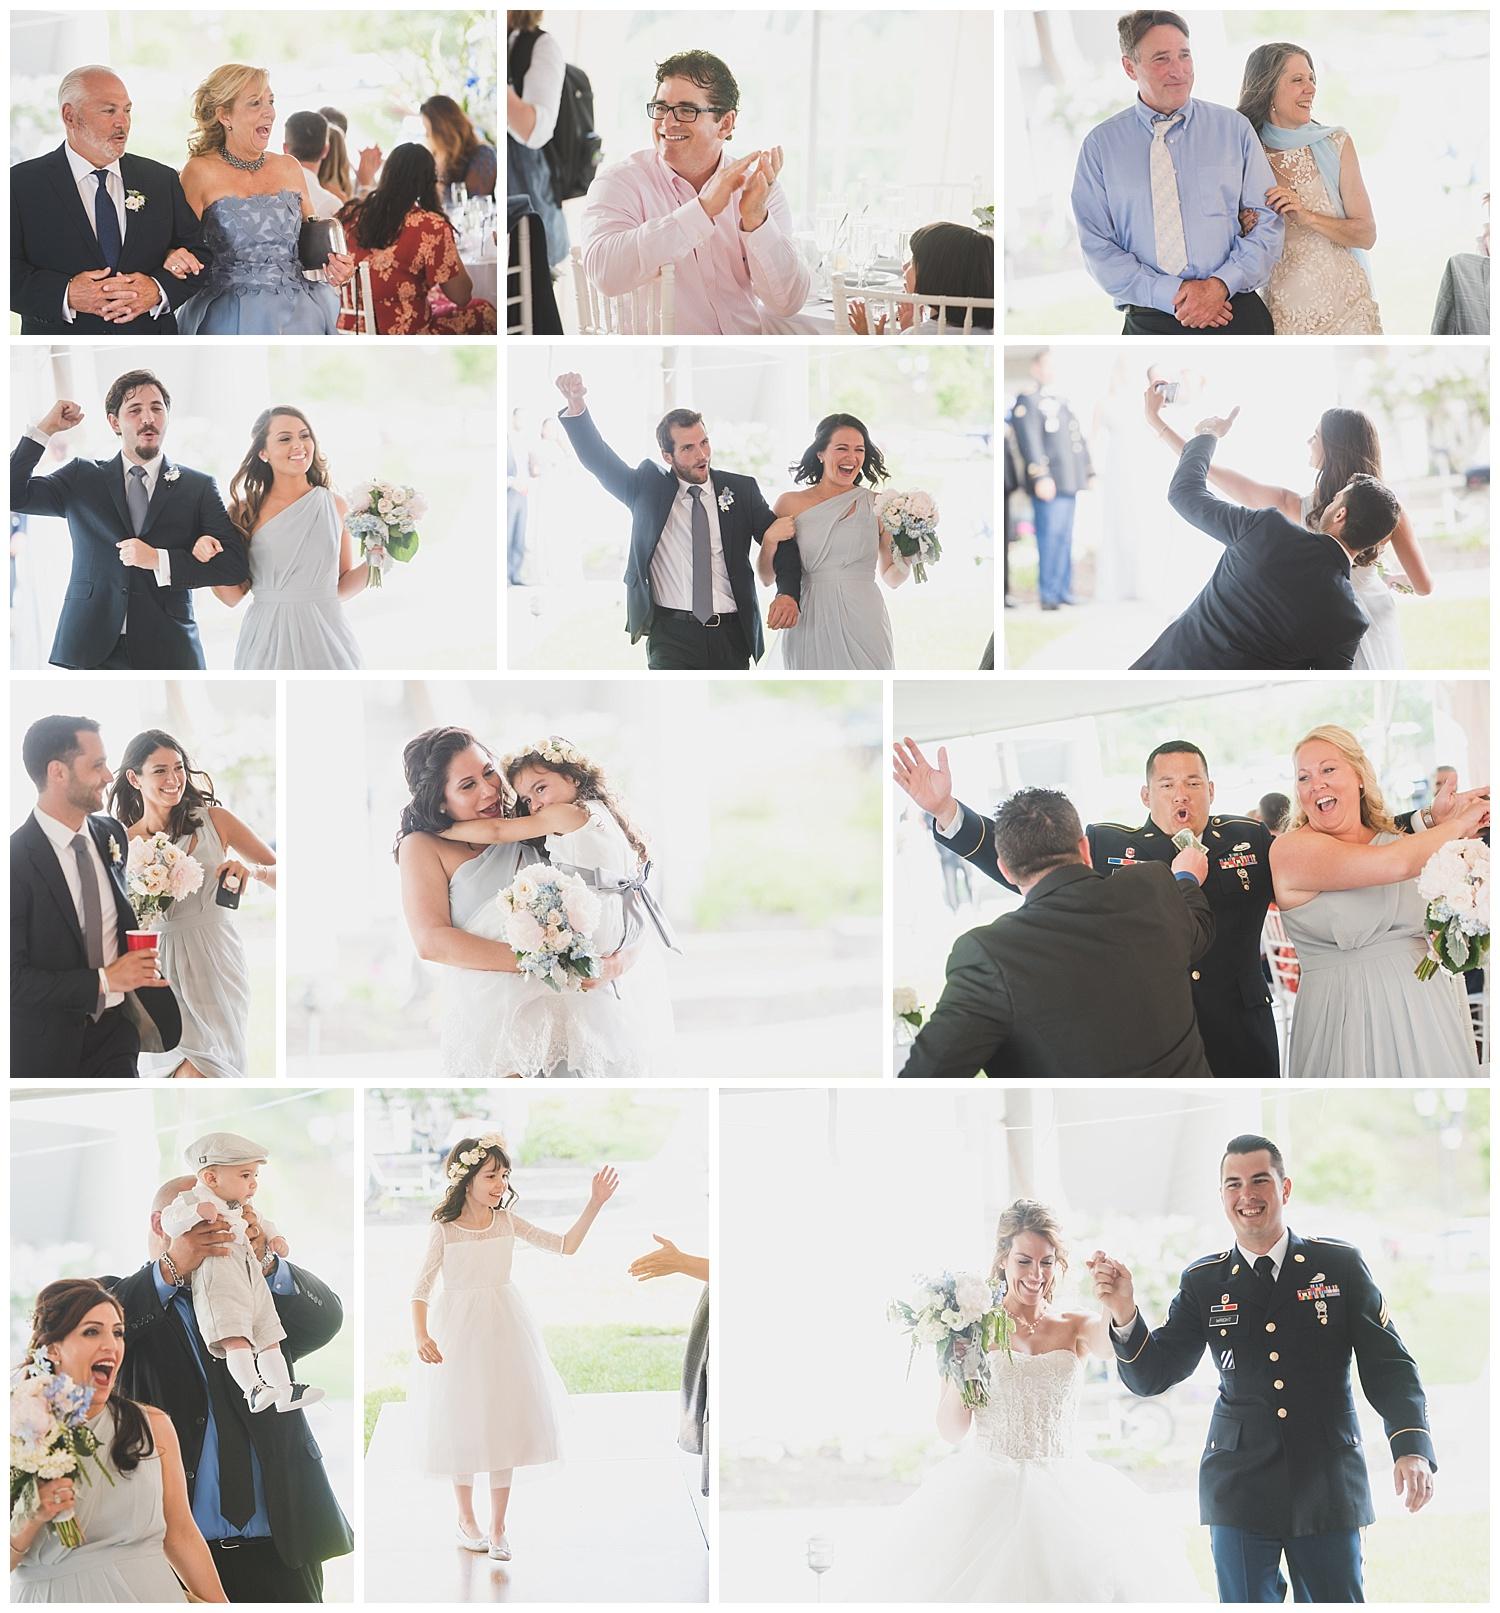 Beachmere Inn Wedding Photography_0065.jpg